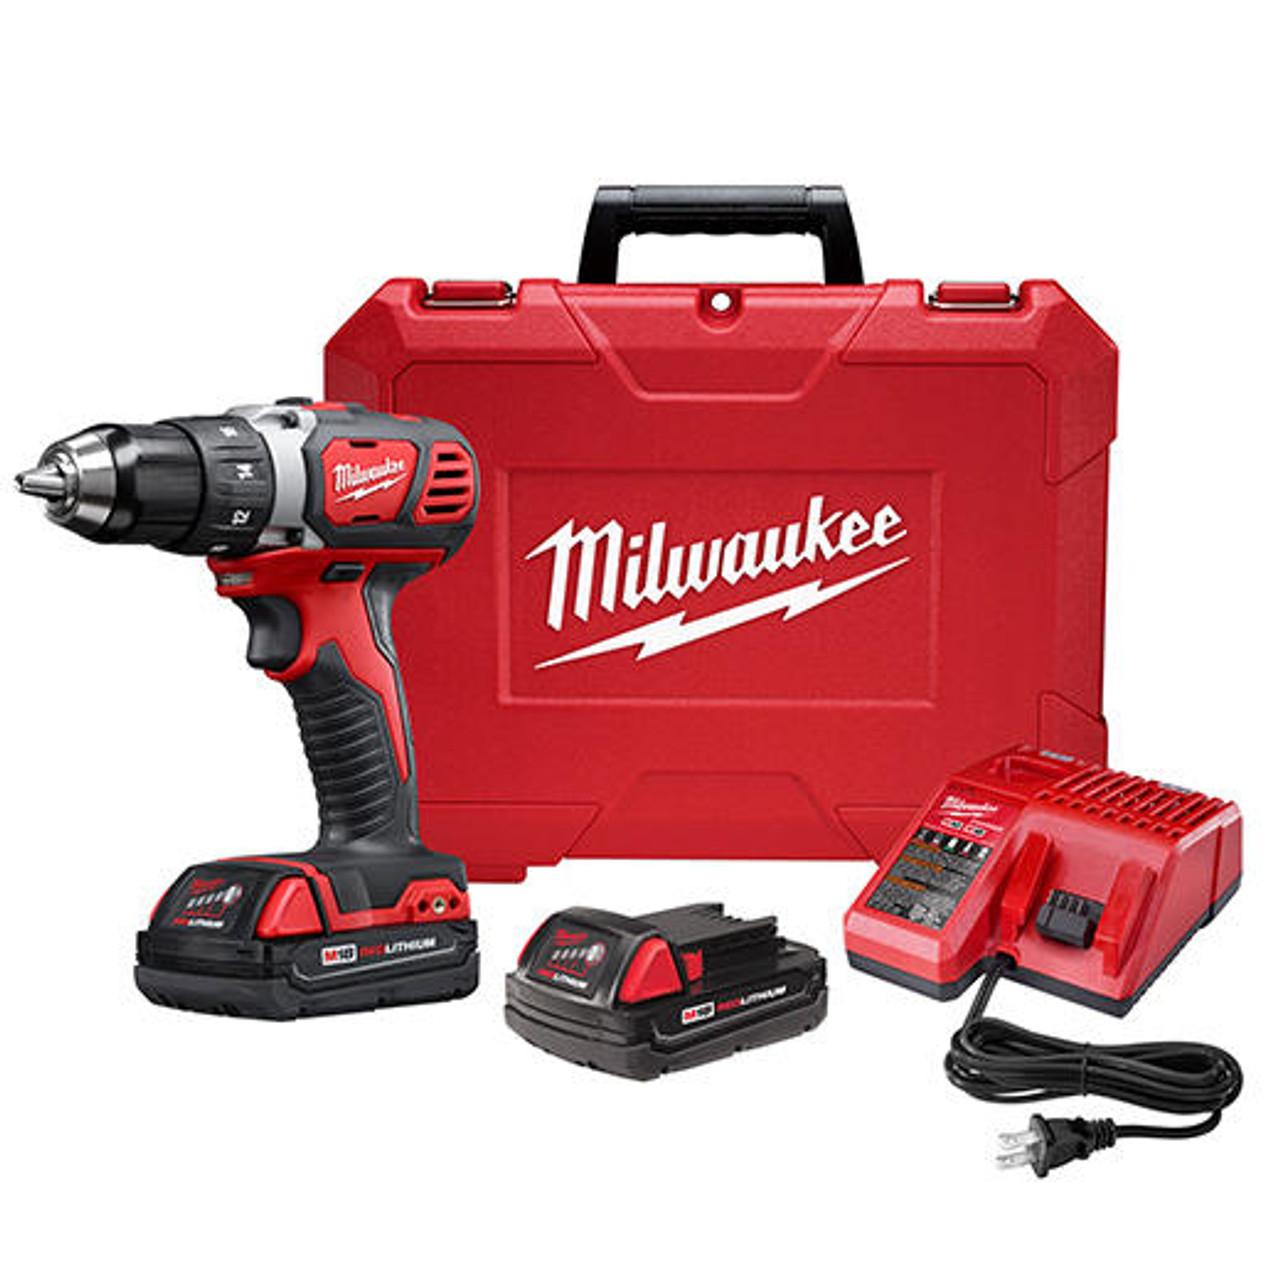 Milwaukee MILWAUKEE ELECTRIC - M18 1/2 DRIVER DRILL CP KIT 2606-22CT